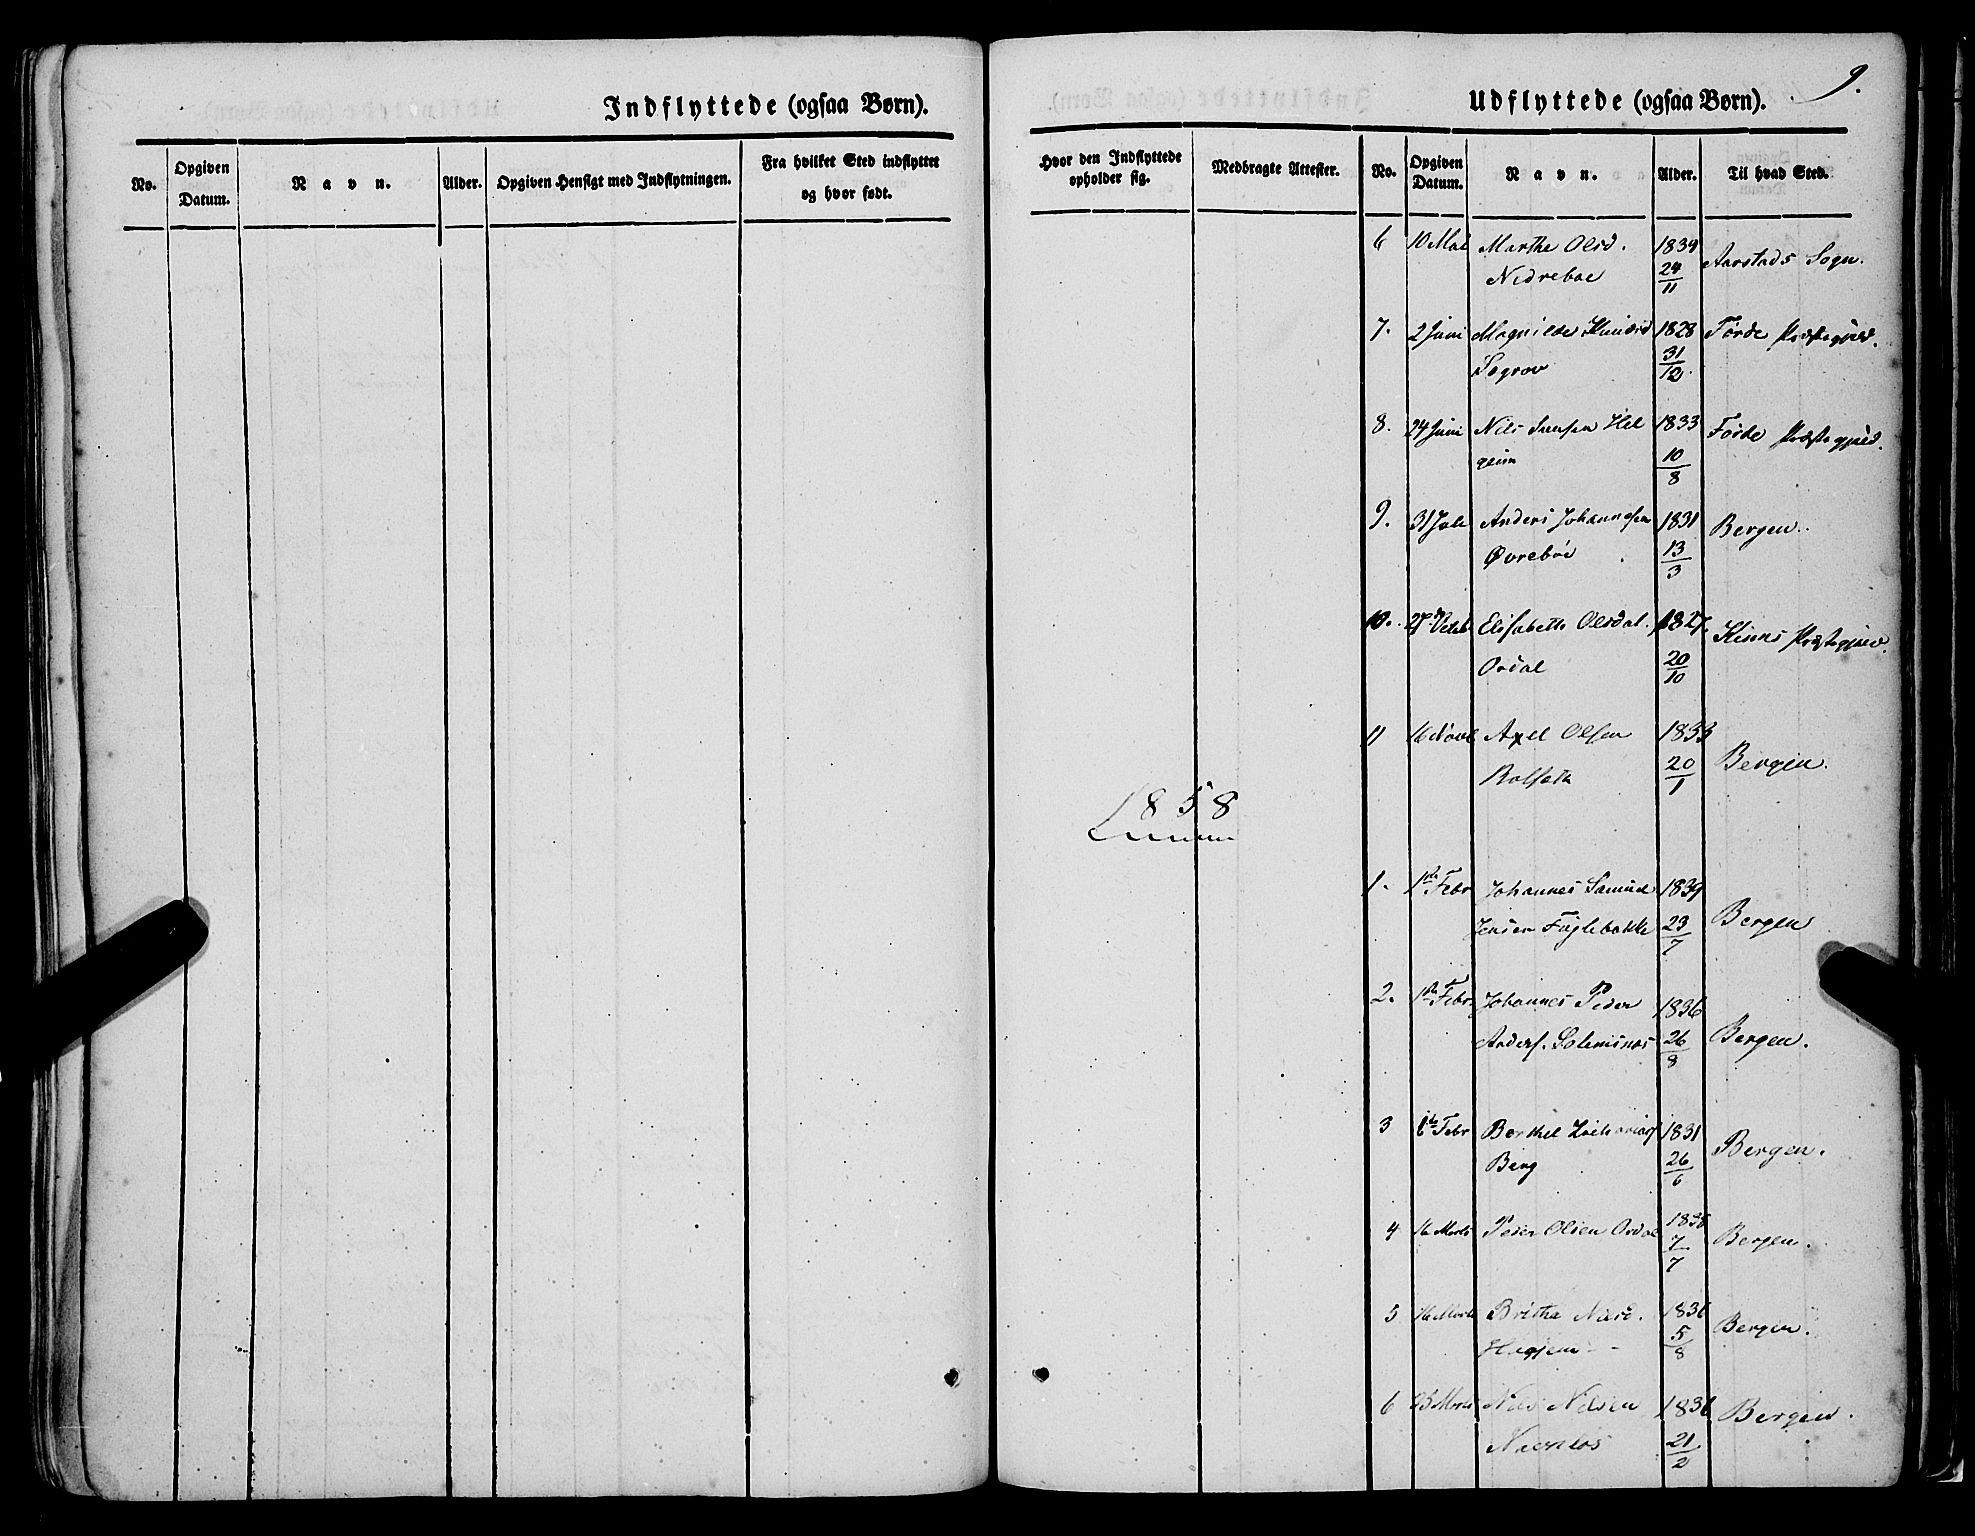 SAB, Jølster sokneprestembete, H/Haa/Haaa/L0010: Parish register (official) no. A 10, 1847-1865, p. 9